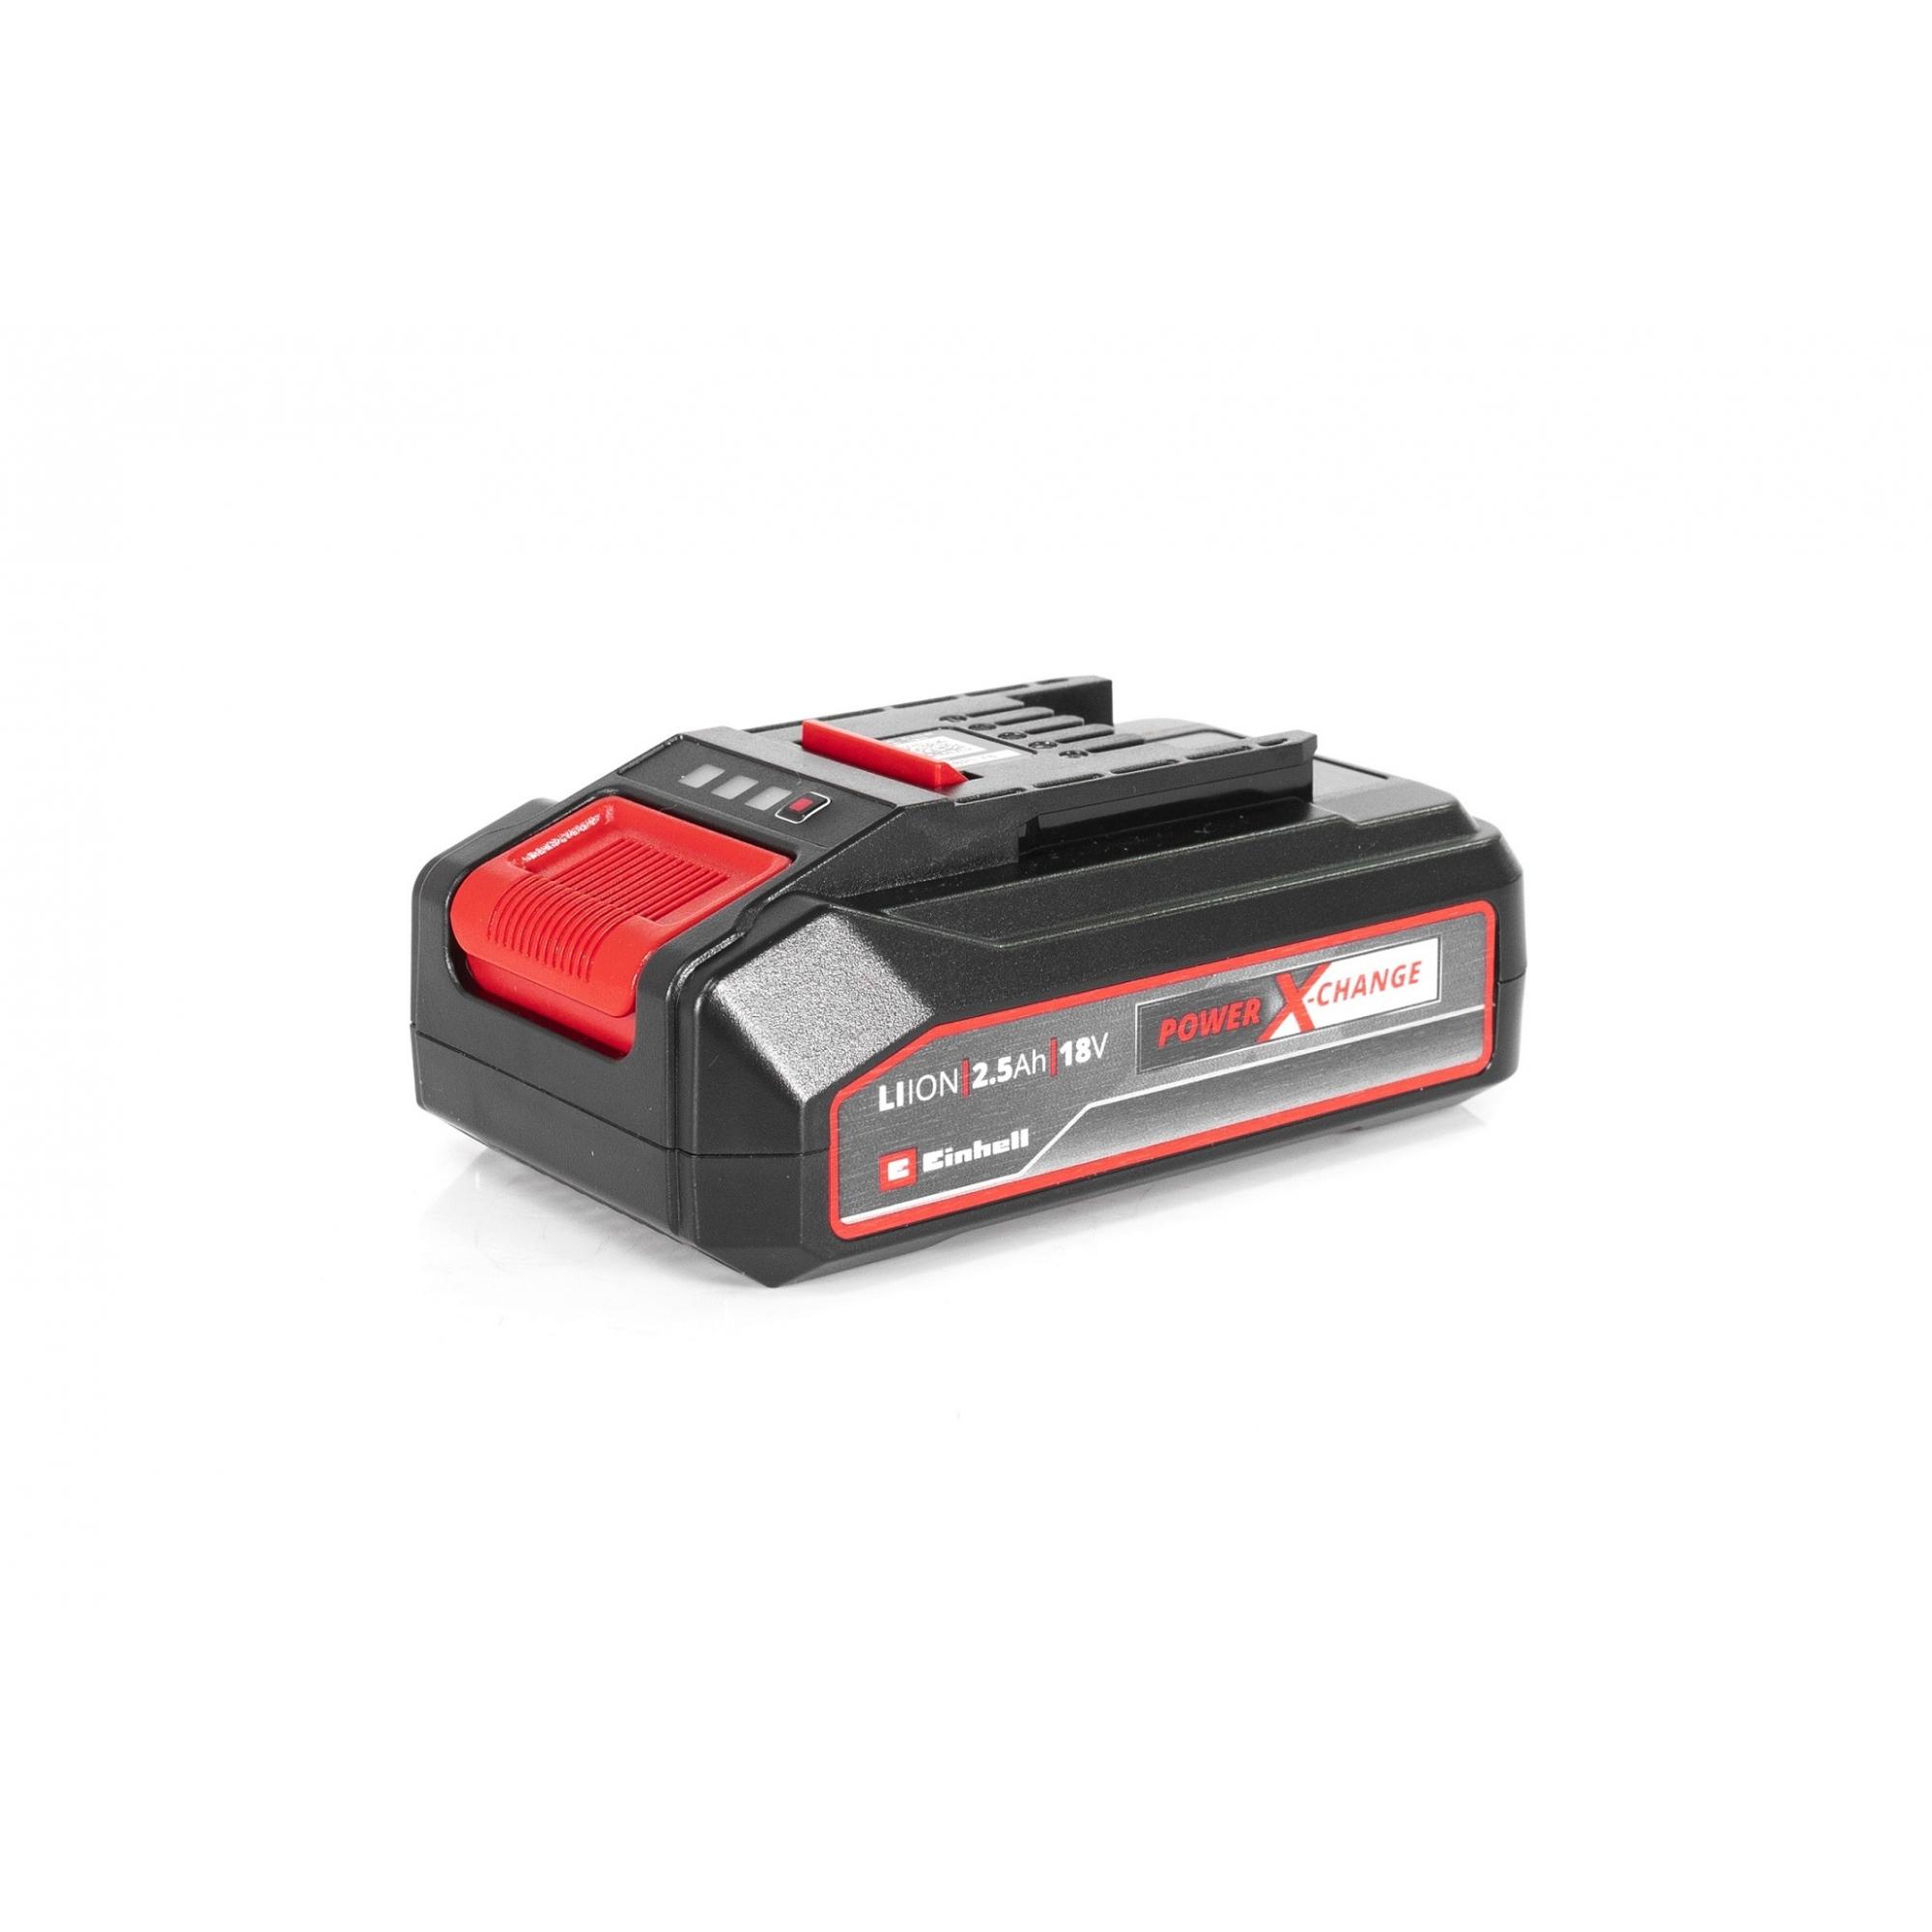 Bateria 2.5 Ah 18V Power X-Change - Einhell